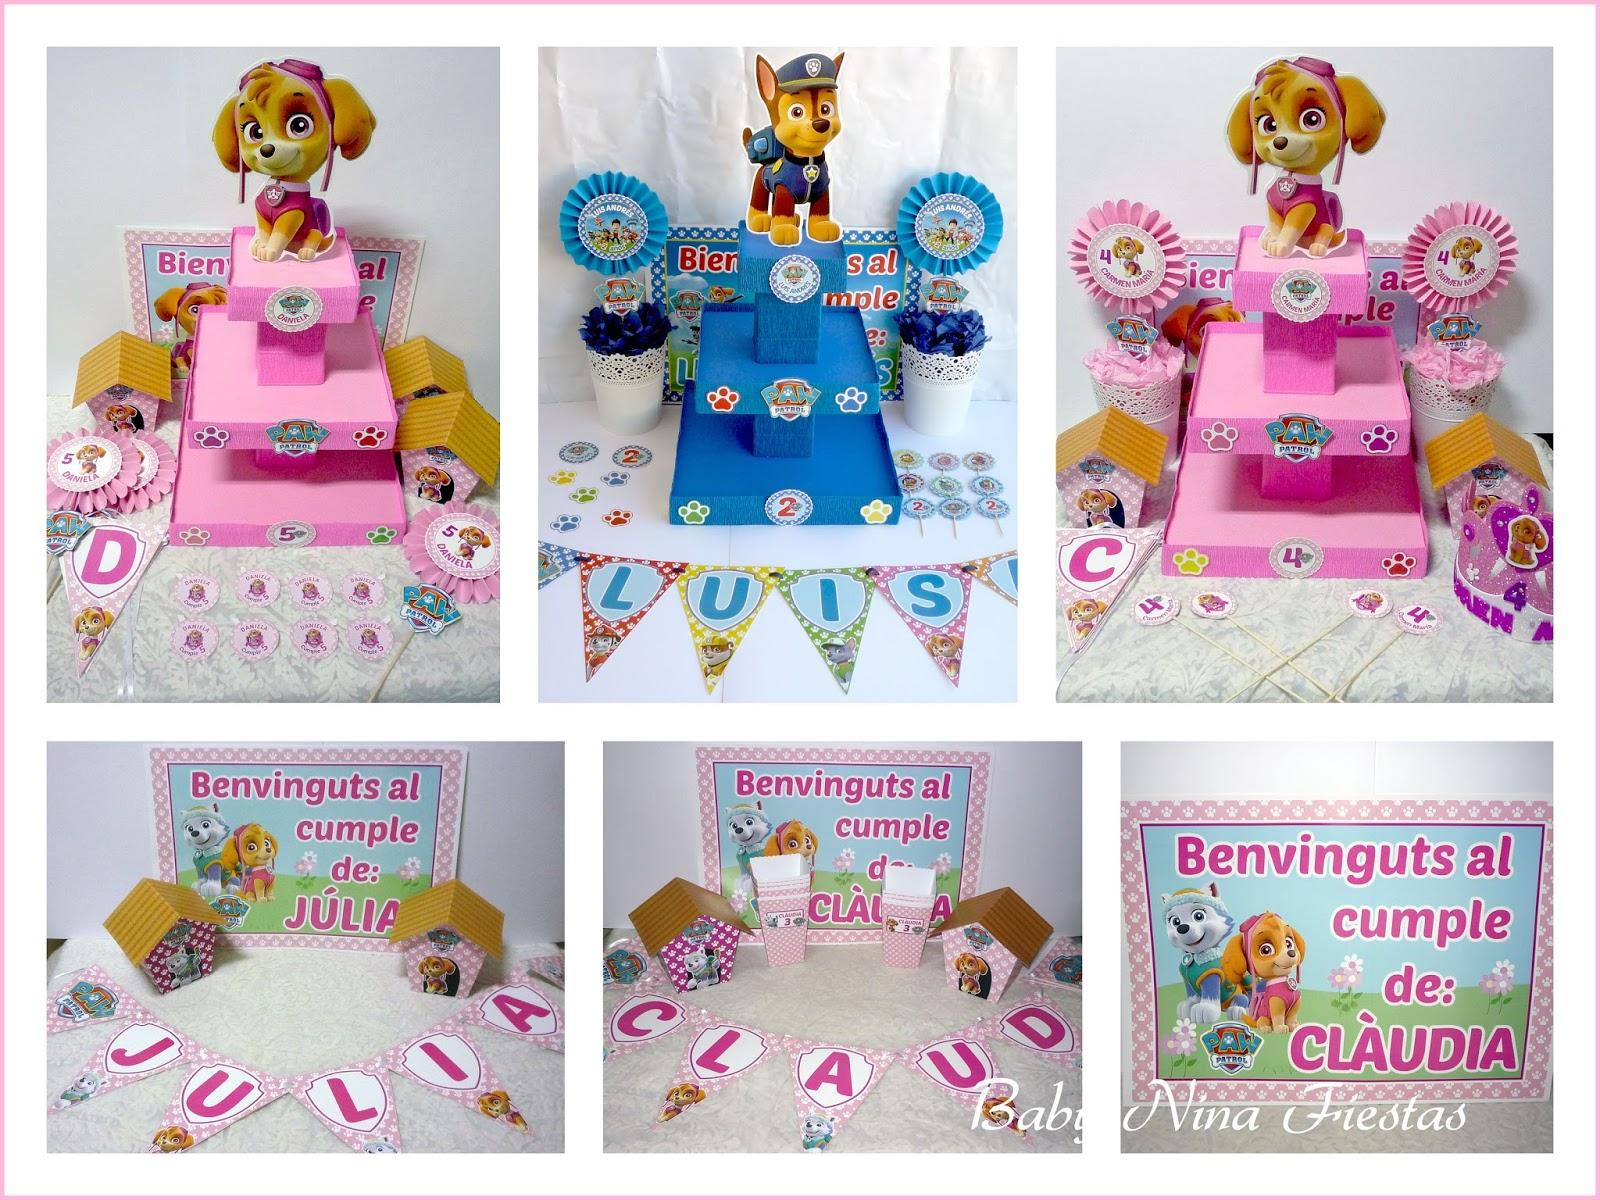 Baby nina fiestas kits cumplea os patrulla canina febrero - Cumpleanos patrulla canina ...